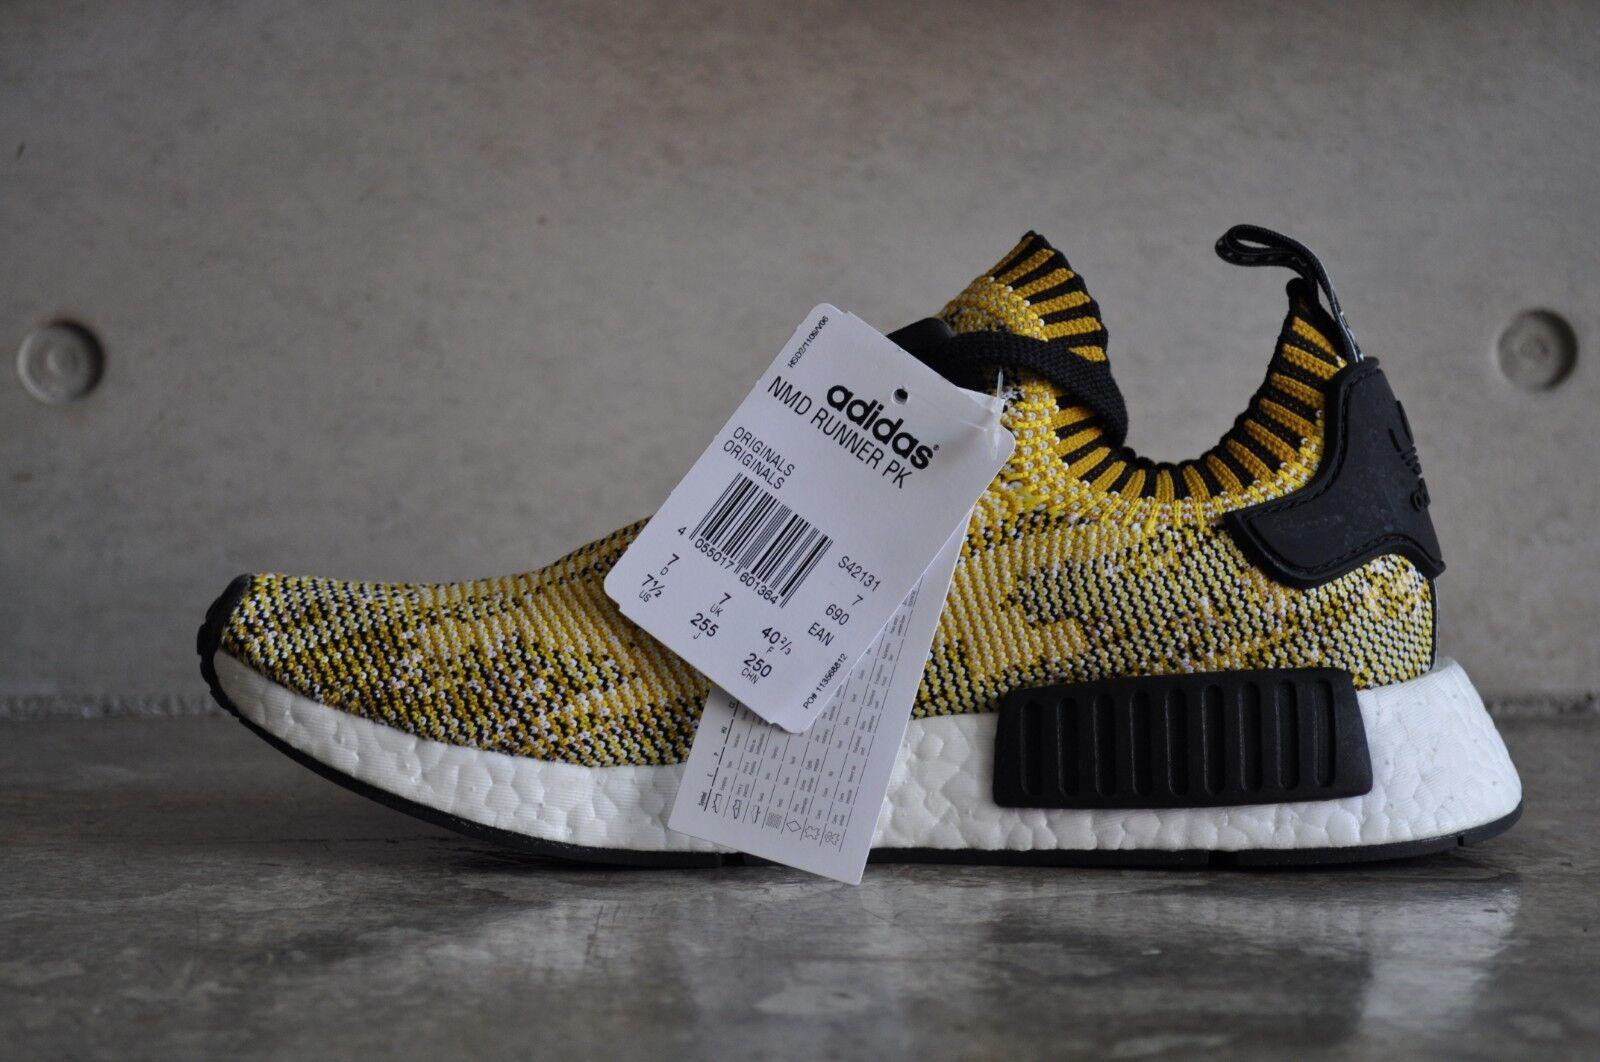 Adidas Originals NMD giallo